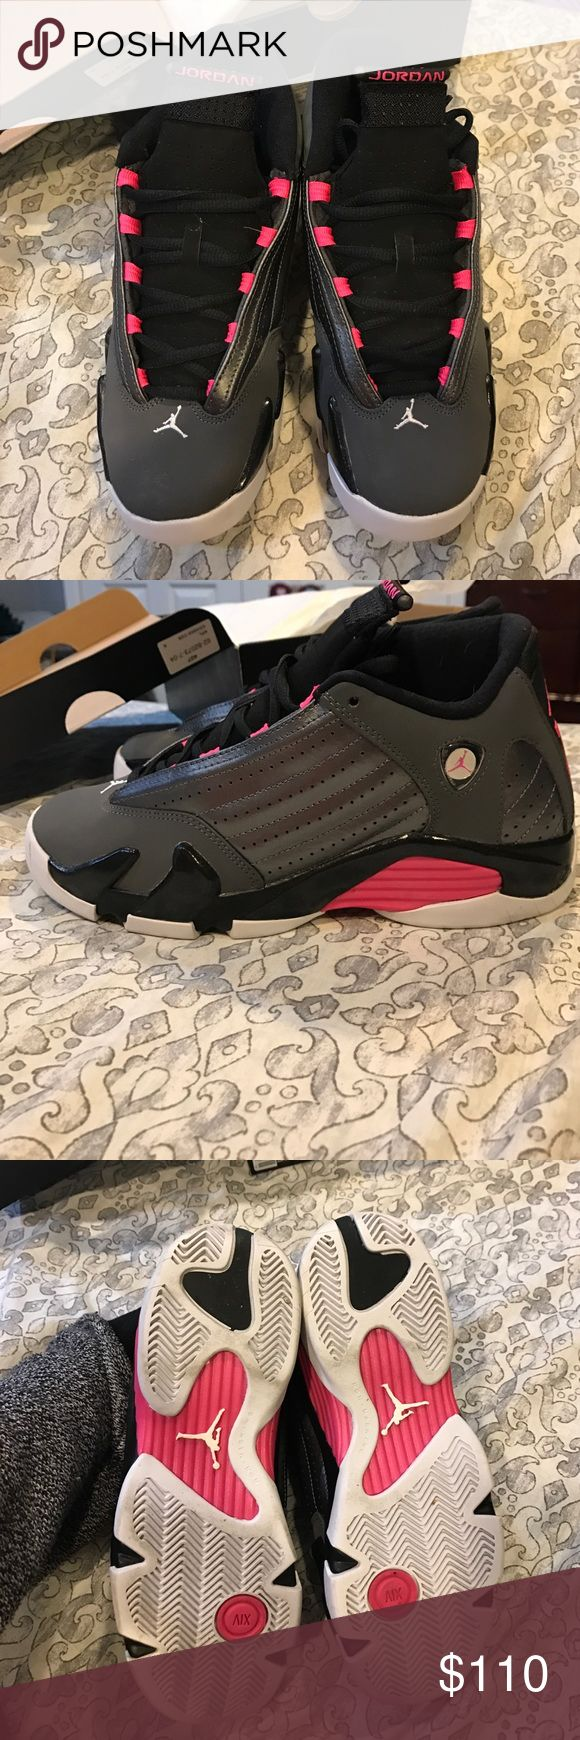 Jordan retro 14 Air Jordan retro 14 grey and pink worn once not visibly in box size 6y Jordan Shoes Sneakers